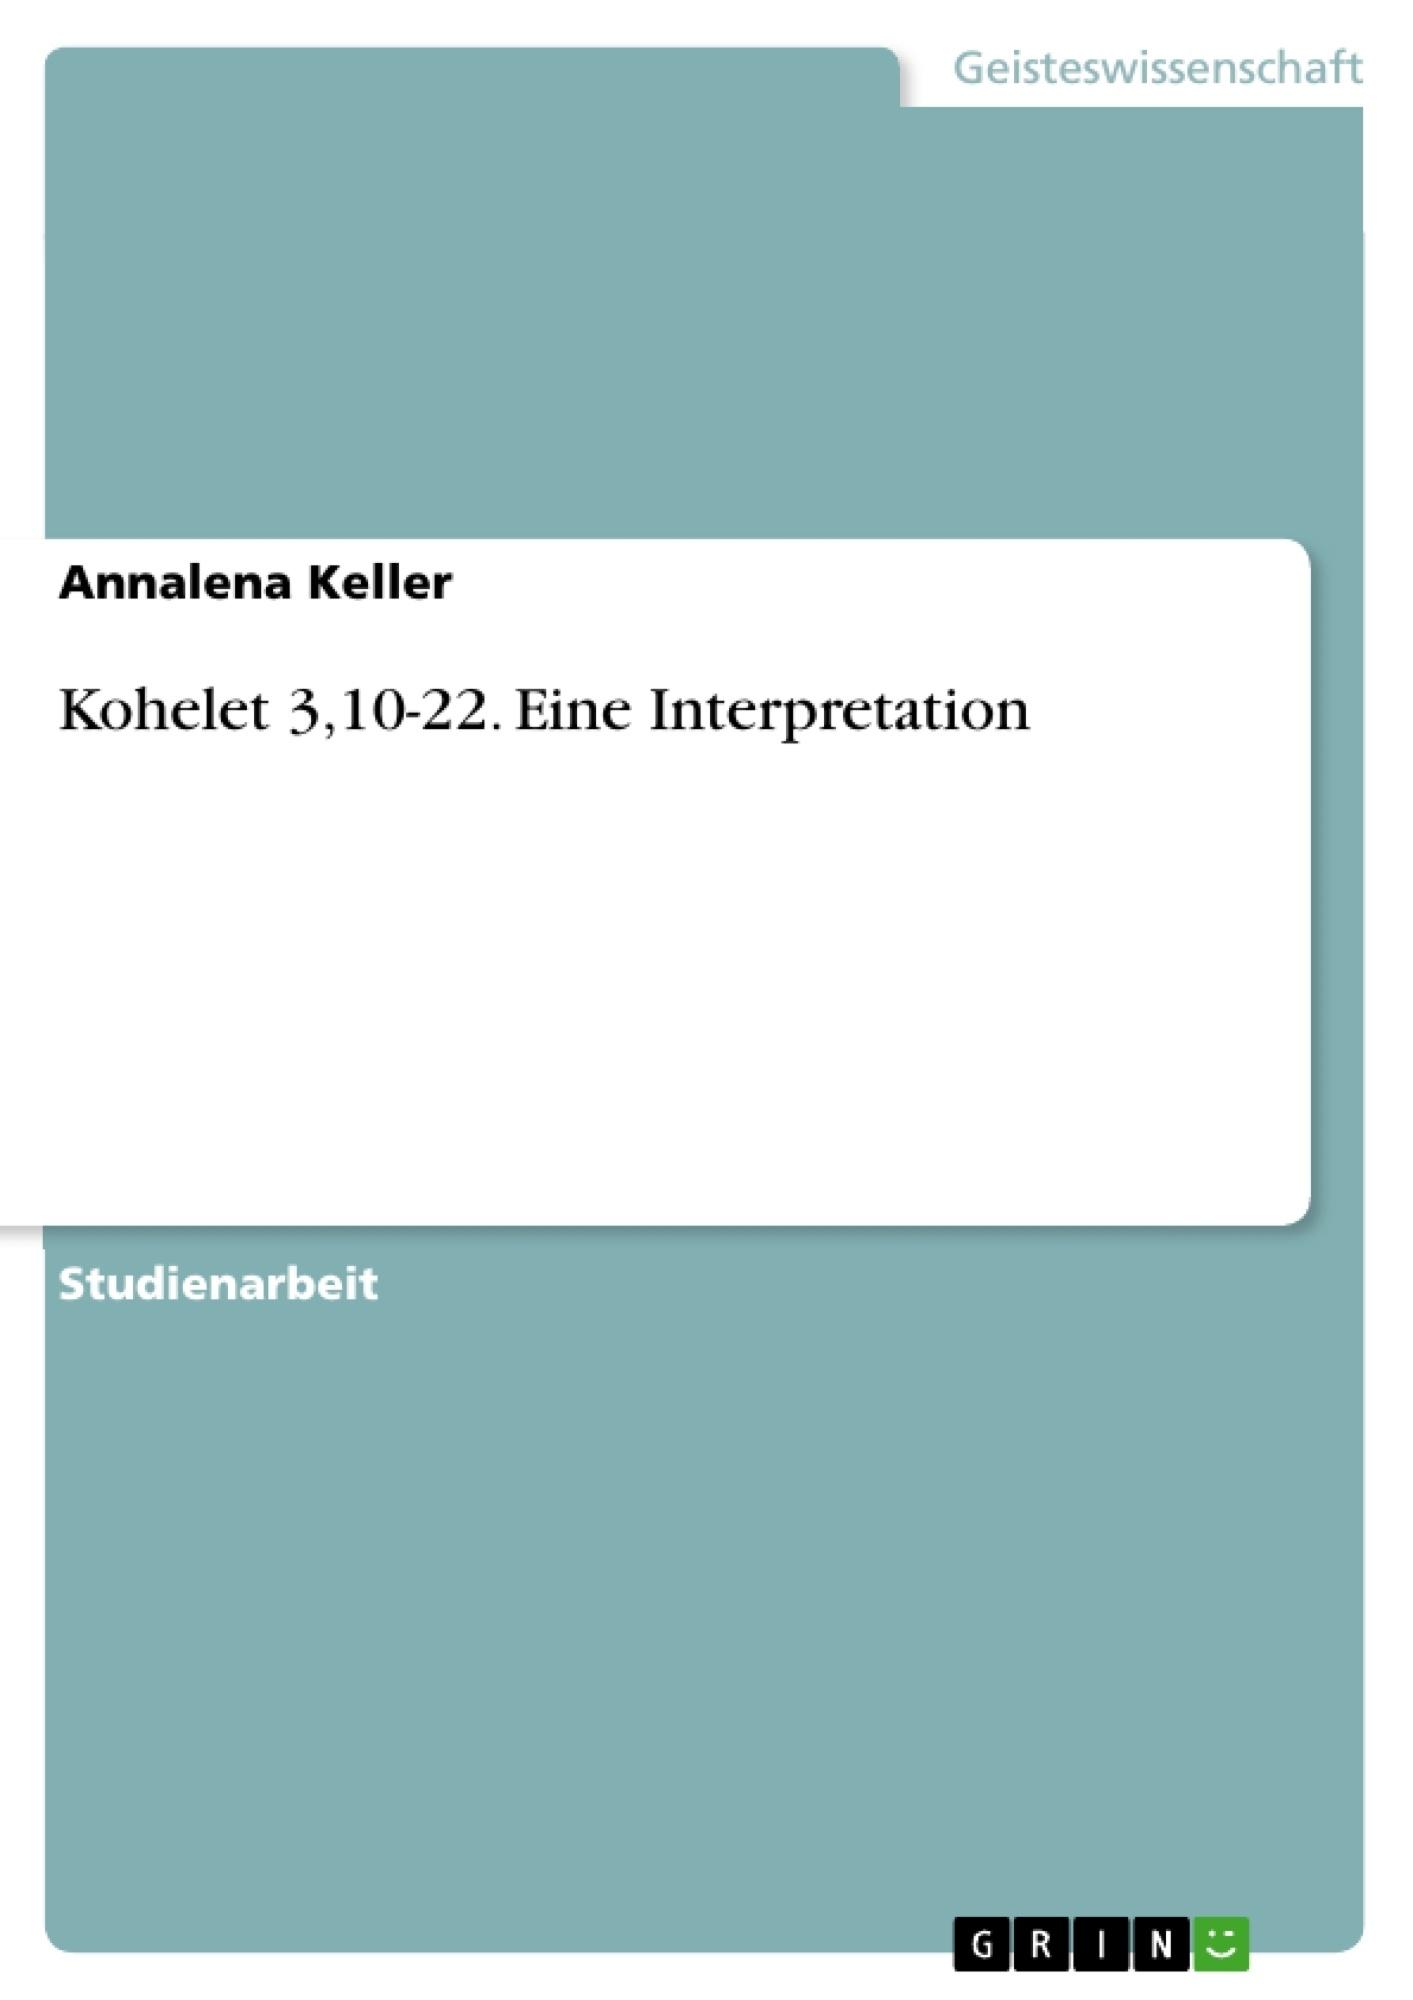 Titel: Kohelet 3,10-22. Eine Interpretation